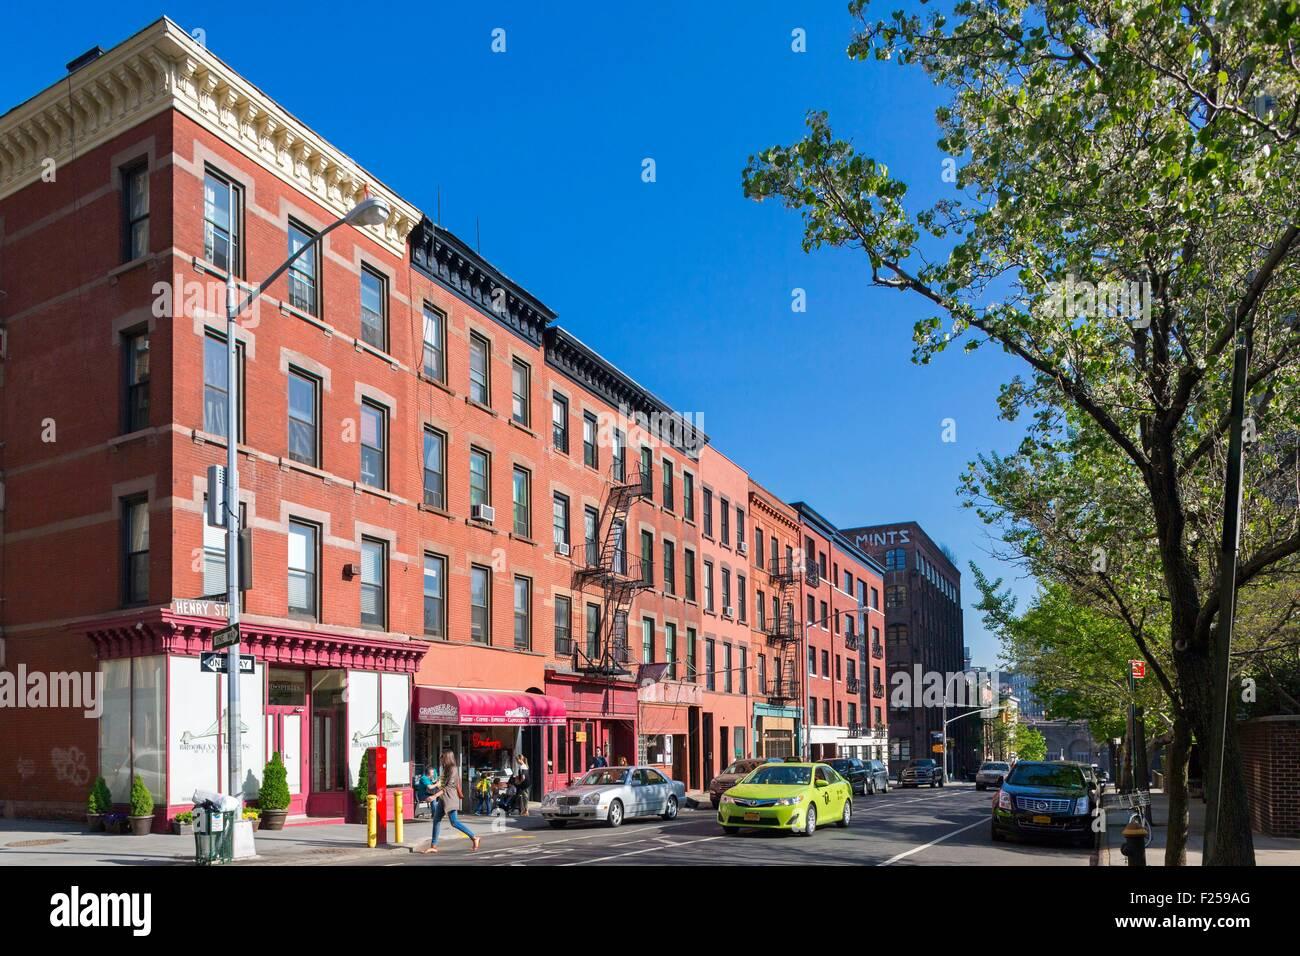 United States, New York, Brooklyn, Brooklyn Heights neighborhood, Cadman Plaza - Stock Image